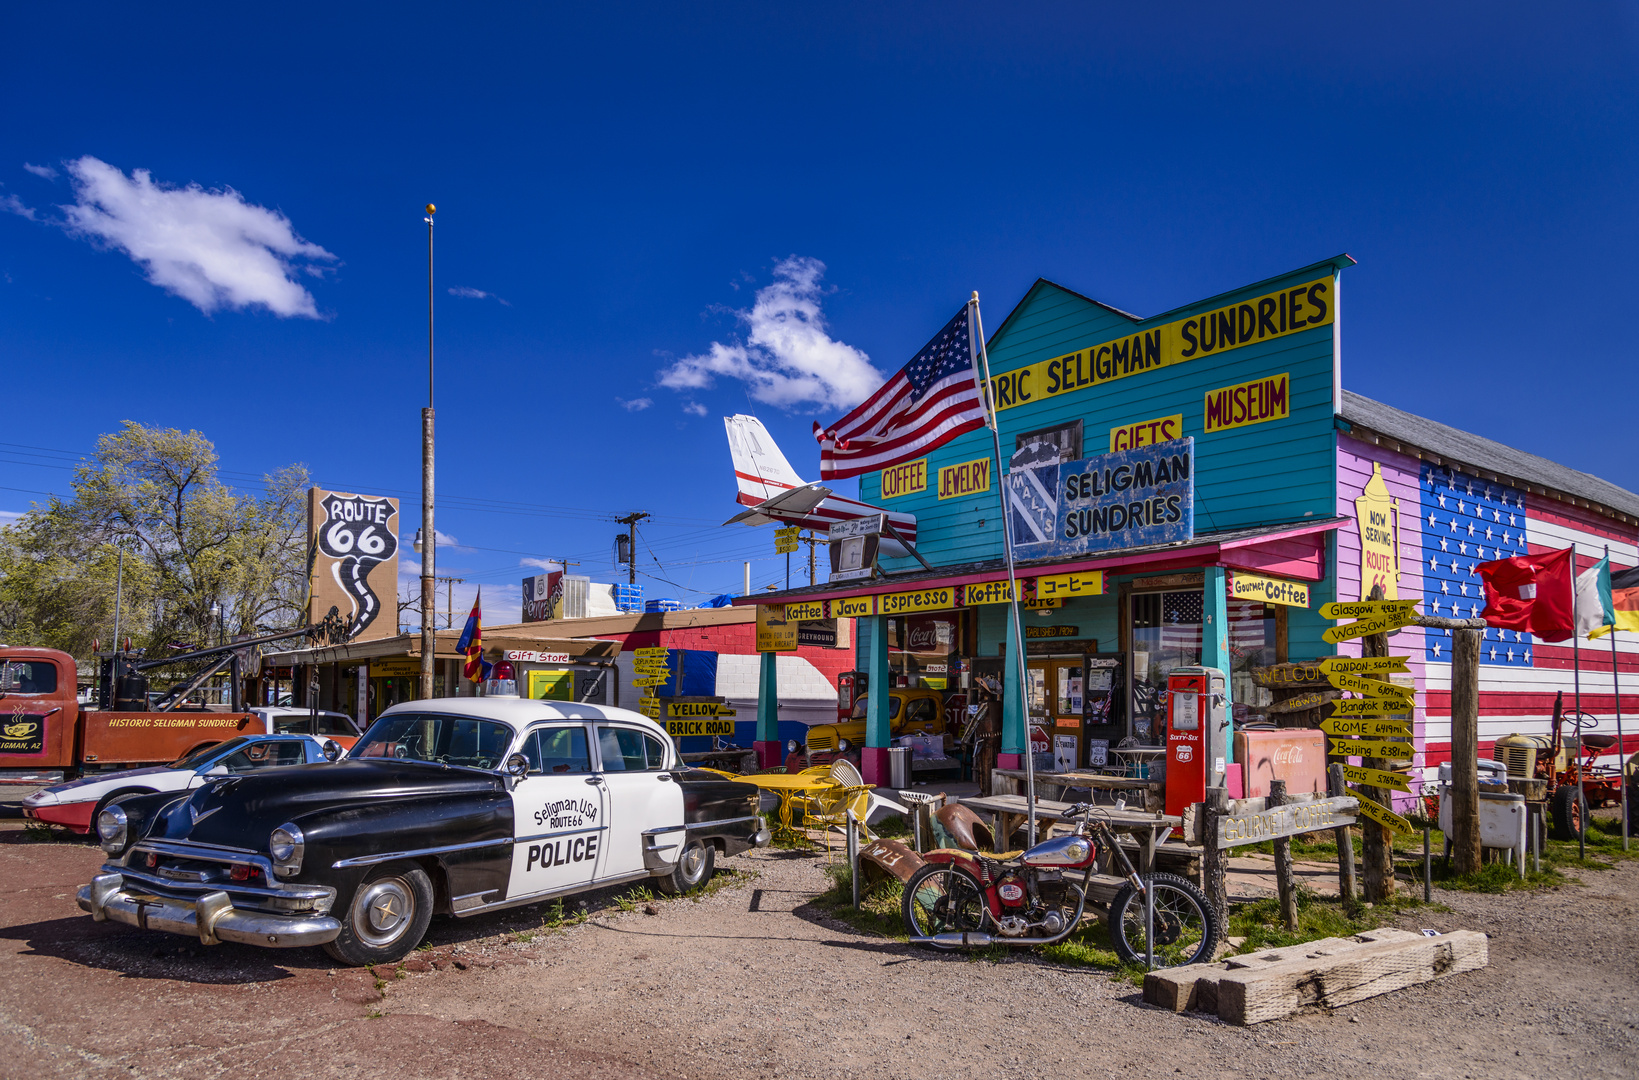 seligman sundries route-66 arizona usa